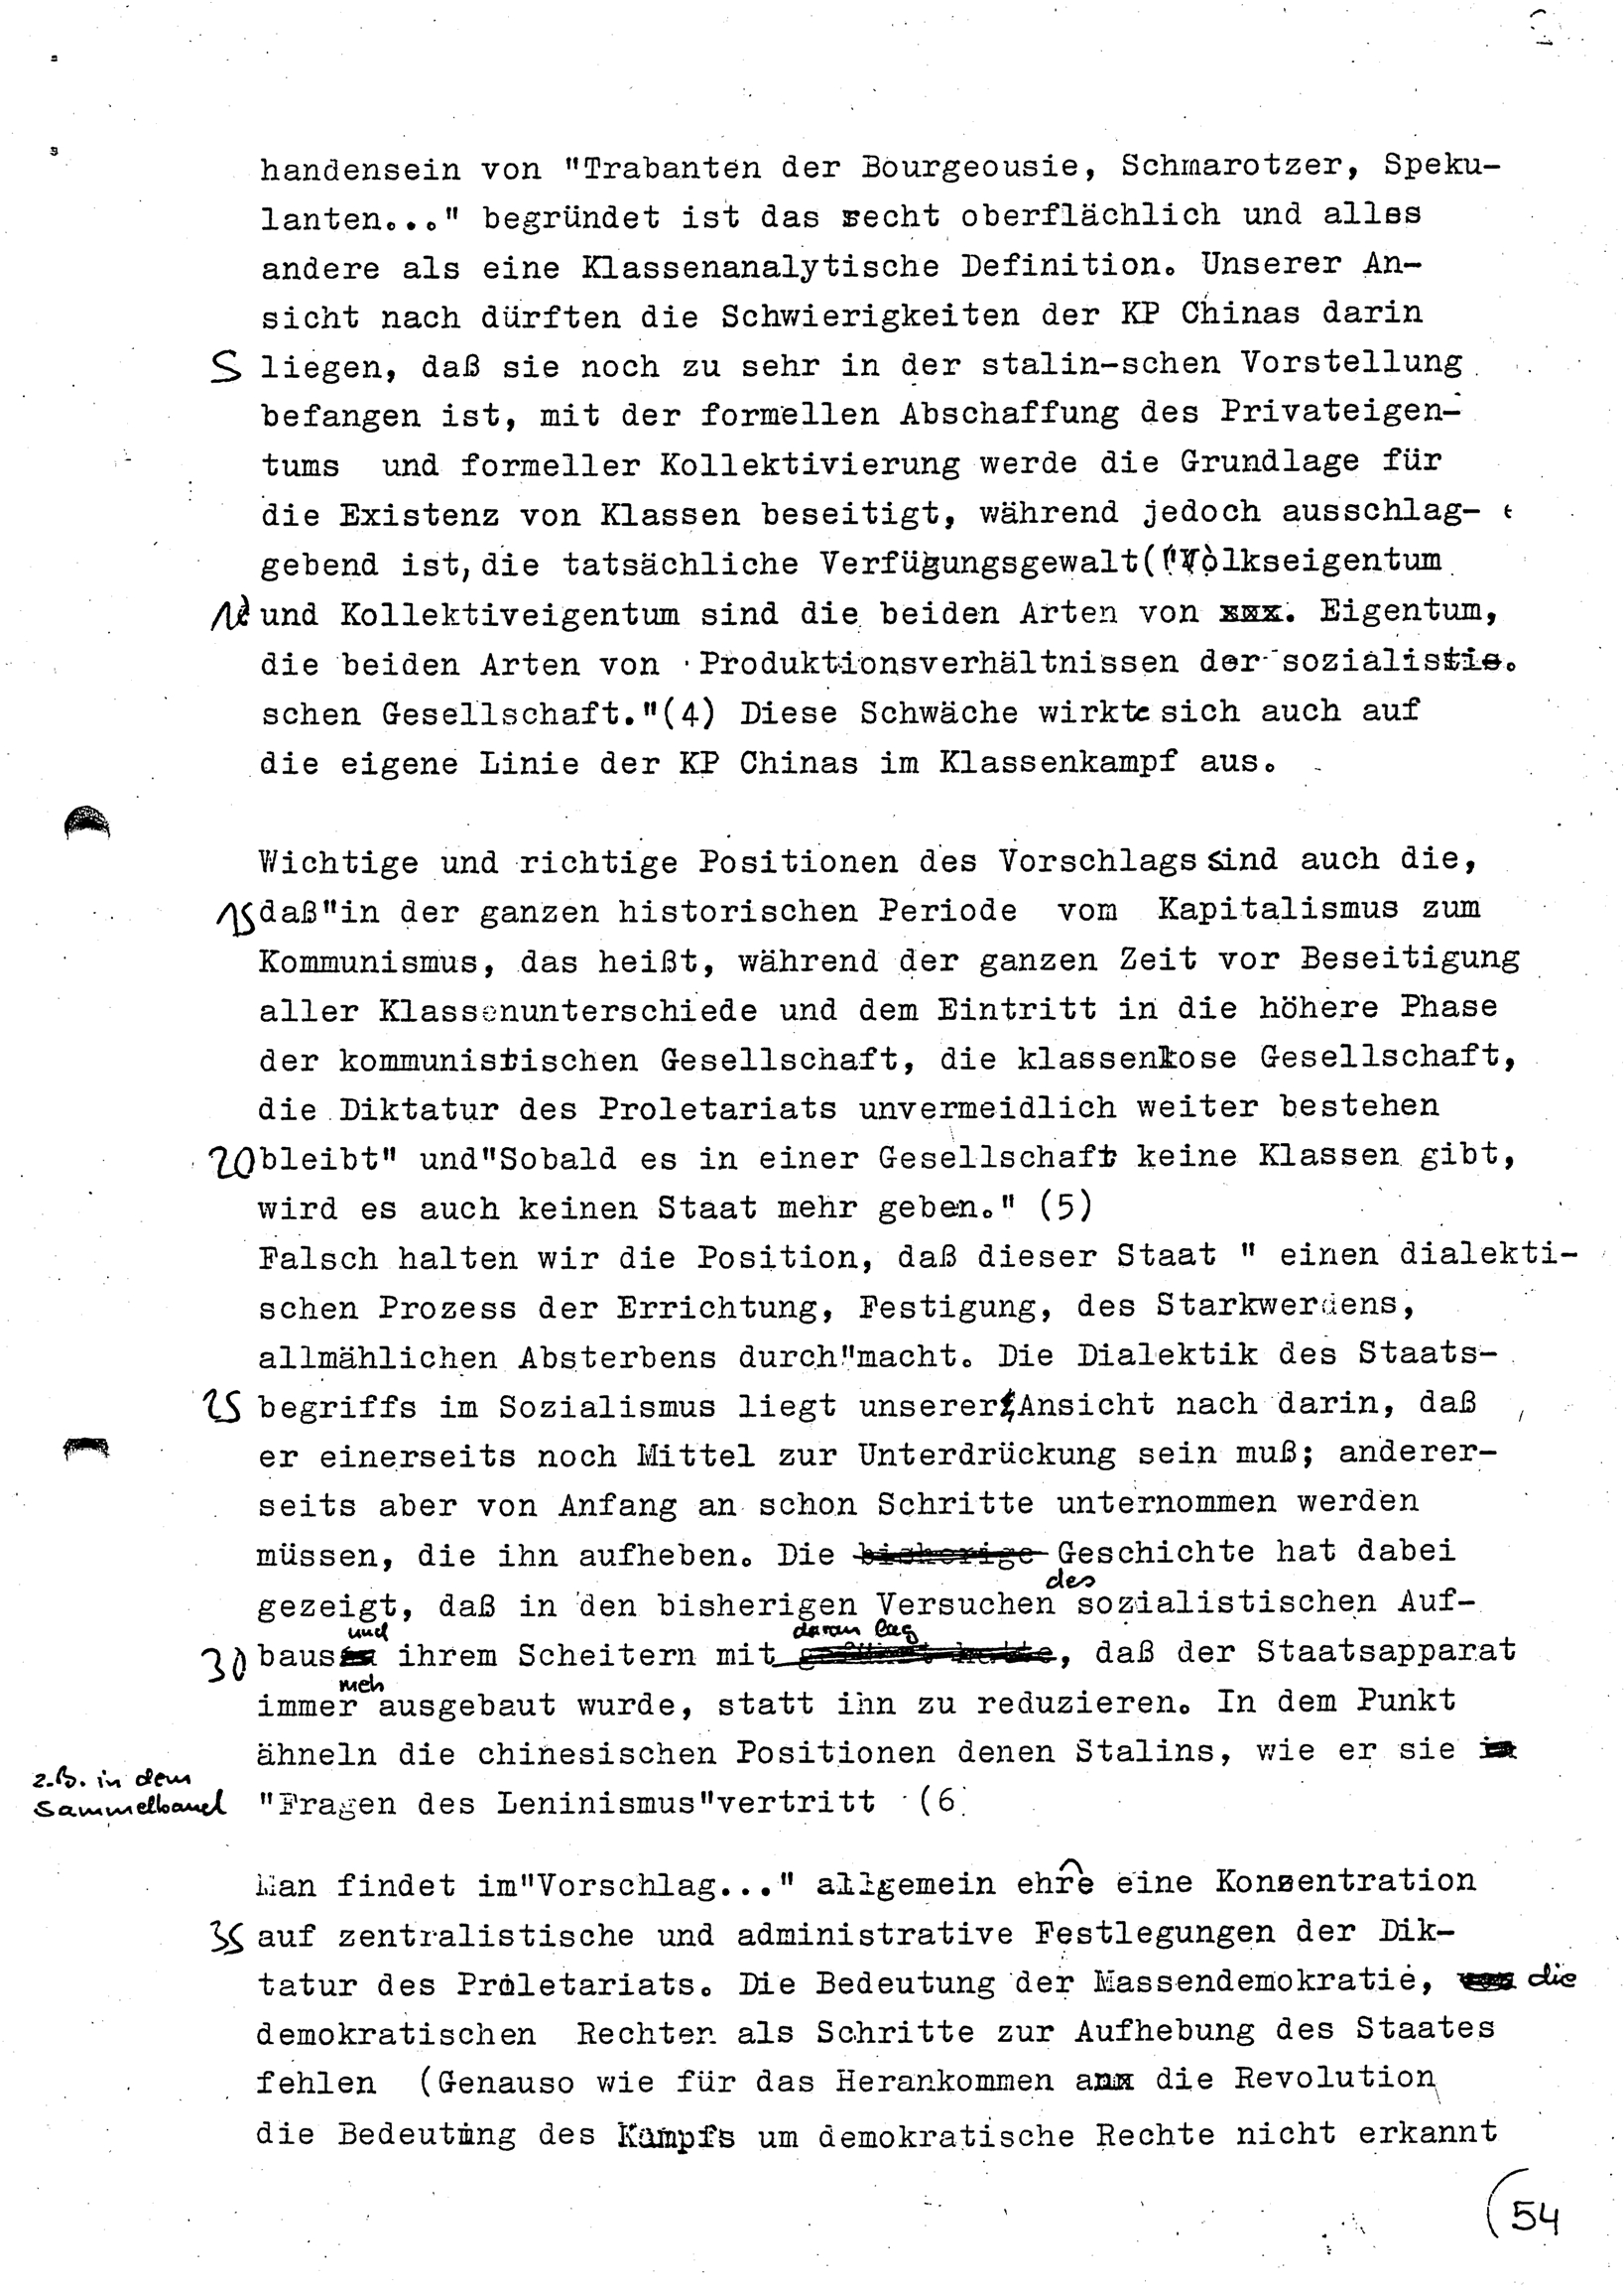 Ulm_KGU_Arbeitsheft_19830425_015_057